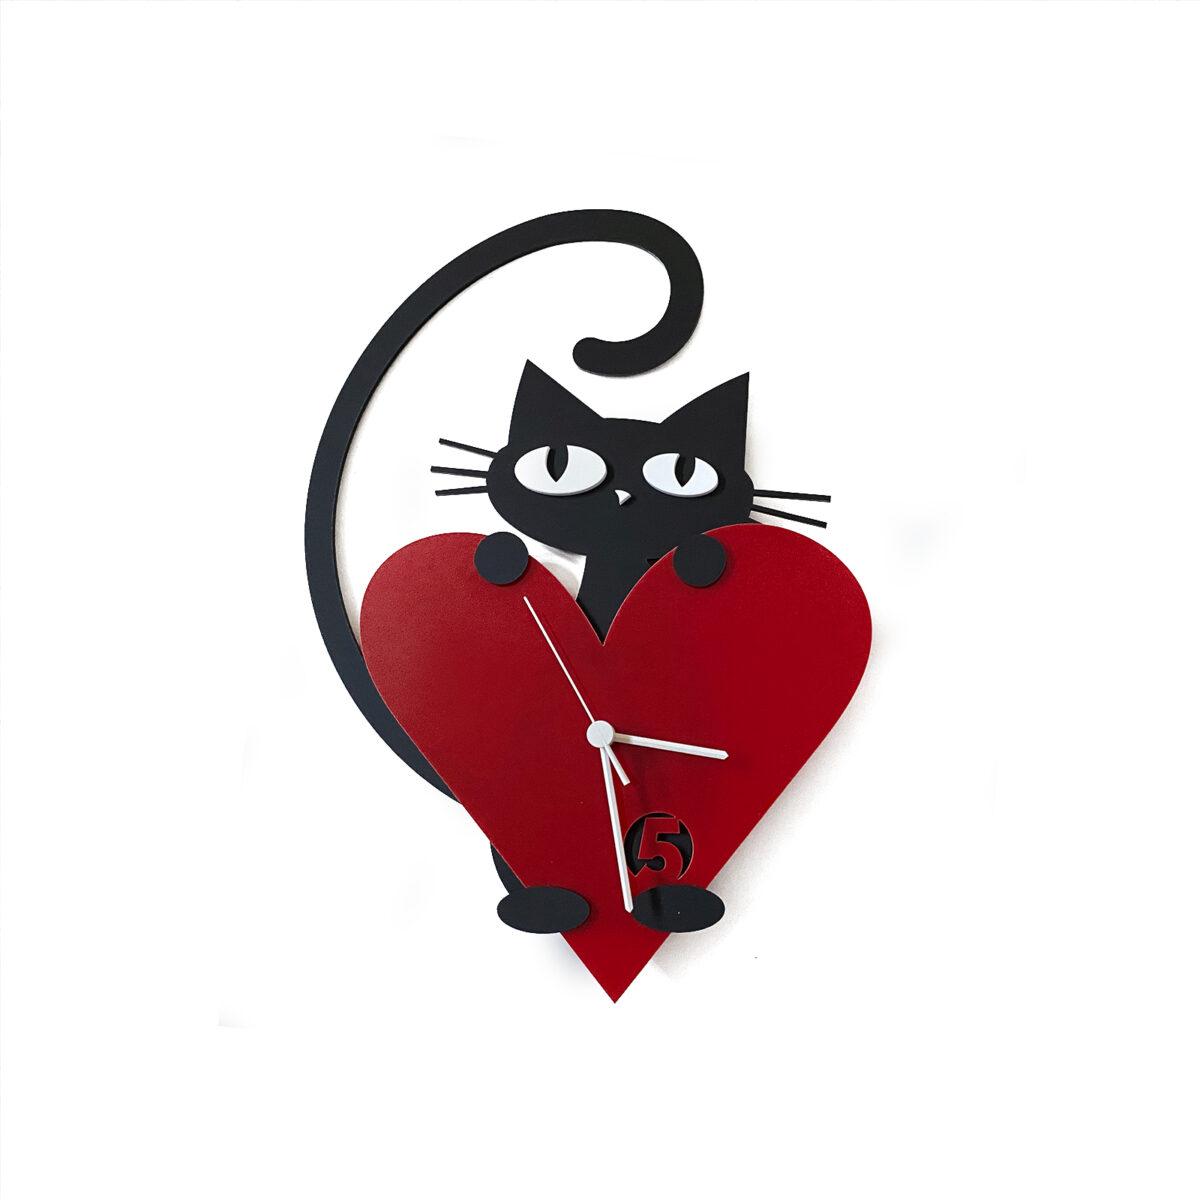 pisicuta iubitoare ceas de perete2